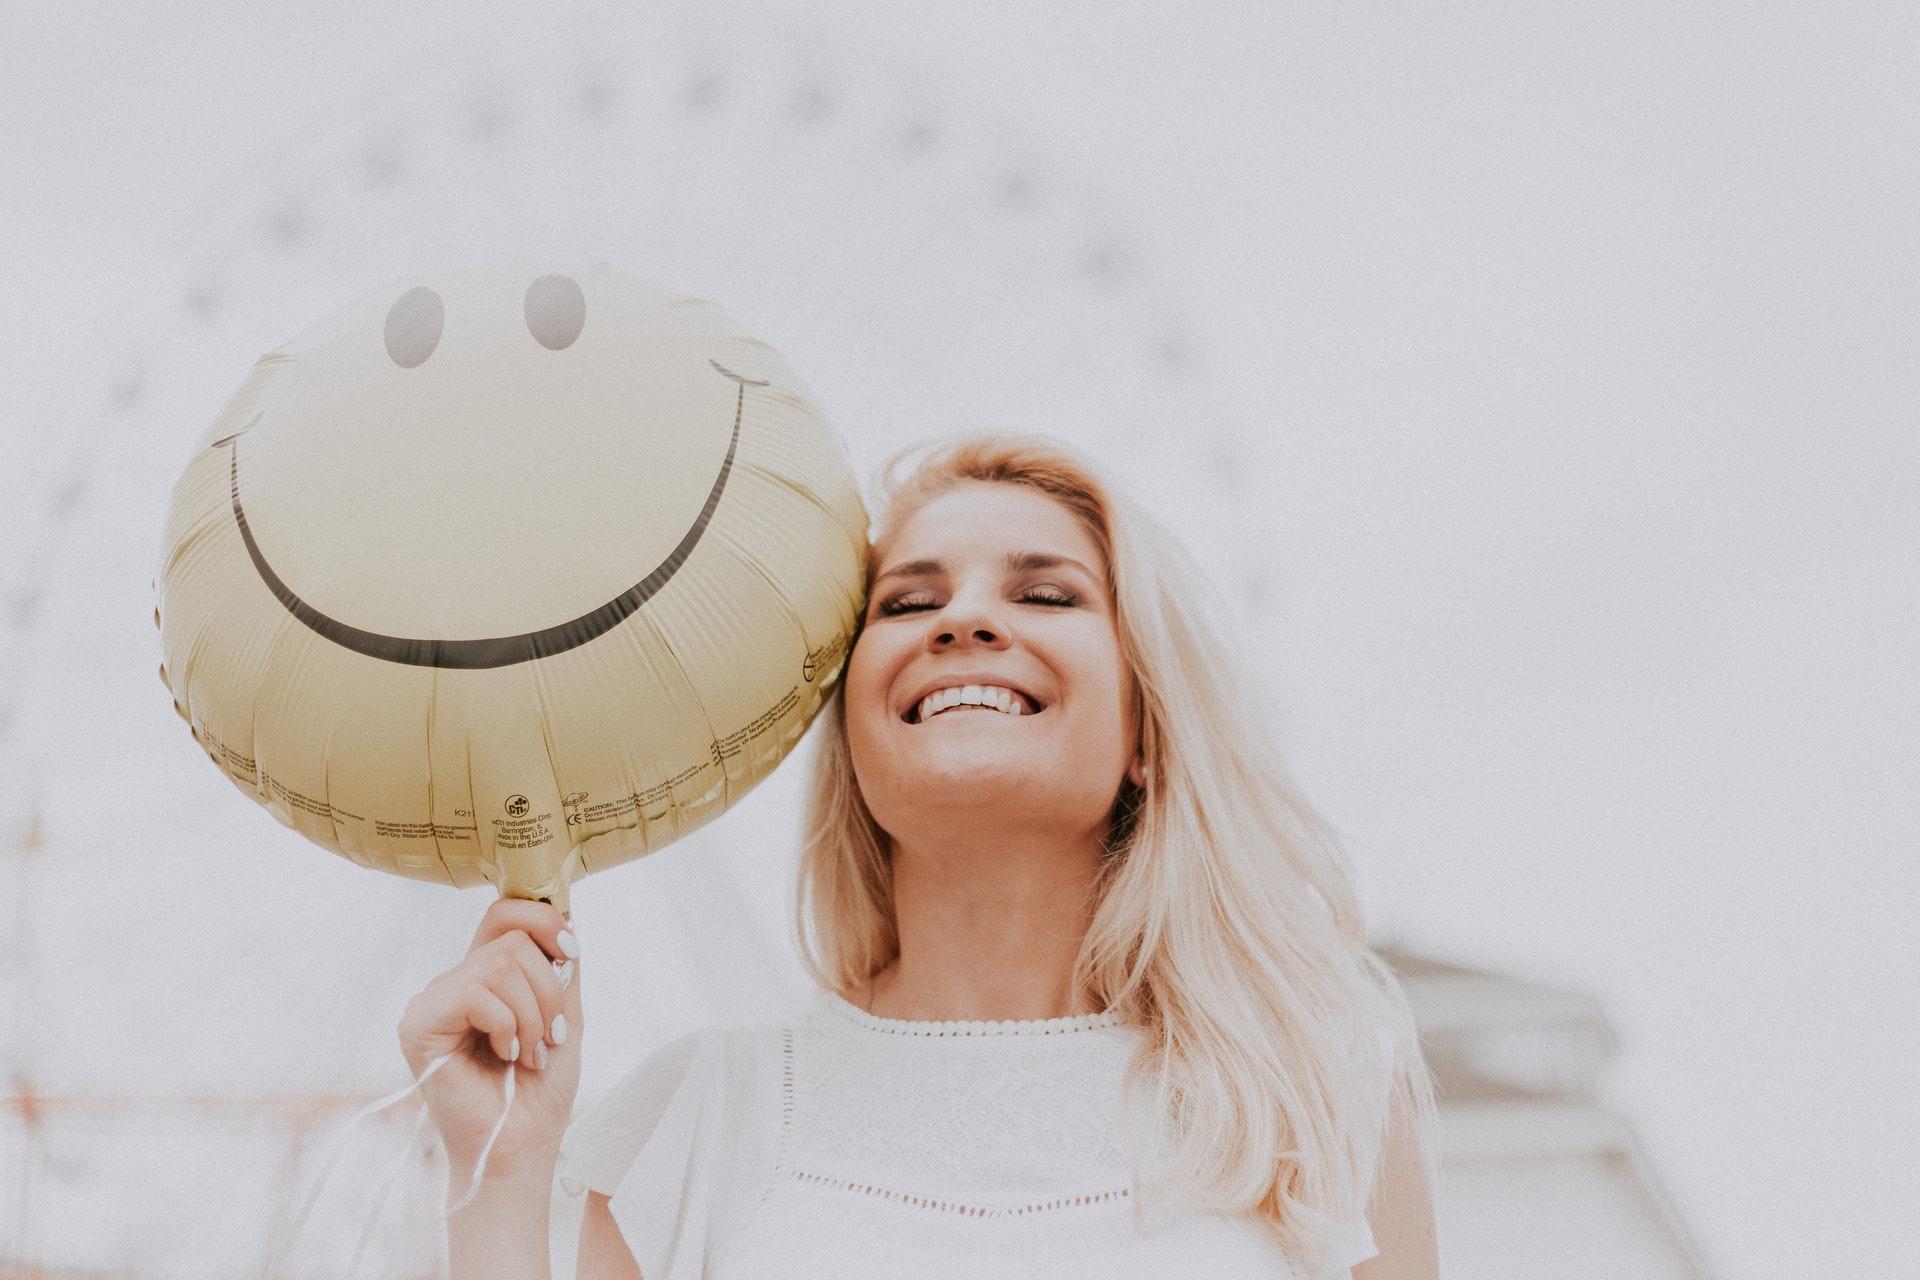 ragazza sorridente palloncino con smile